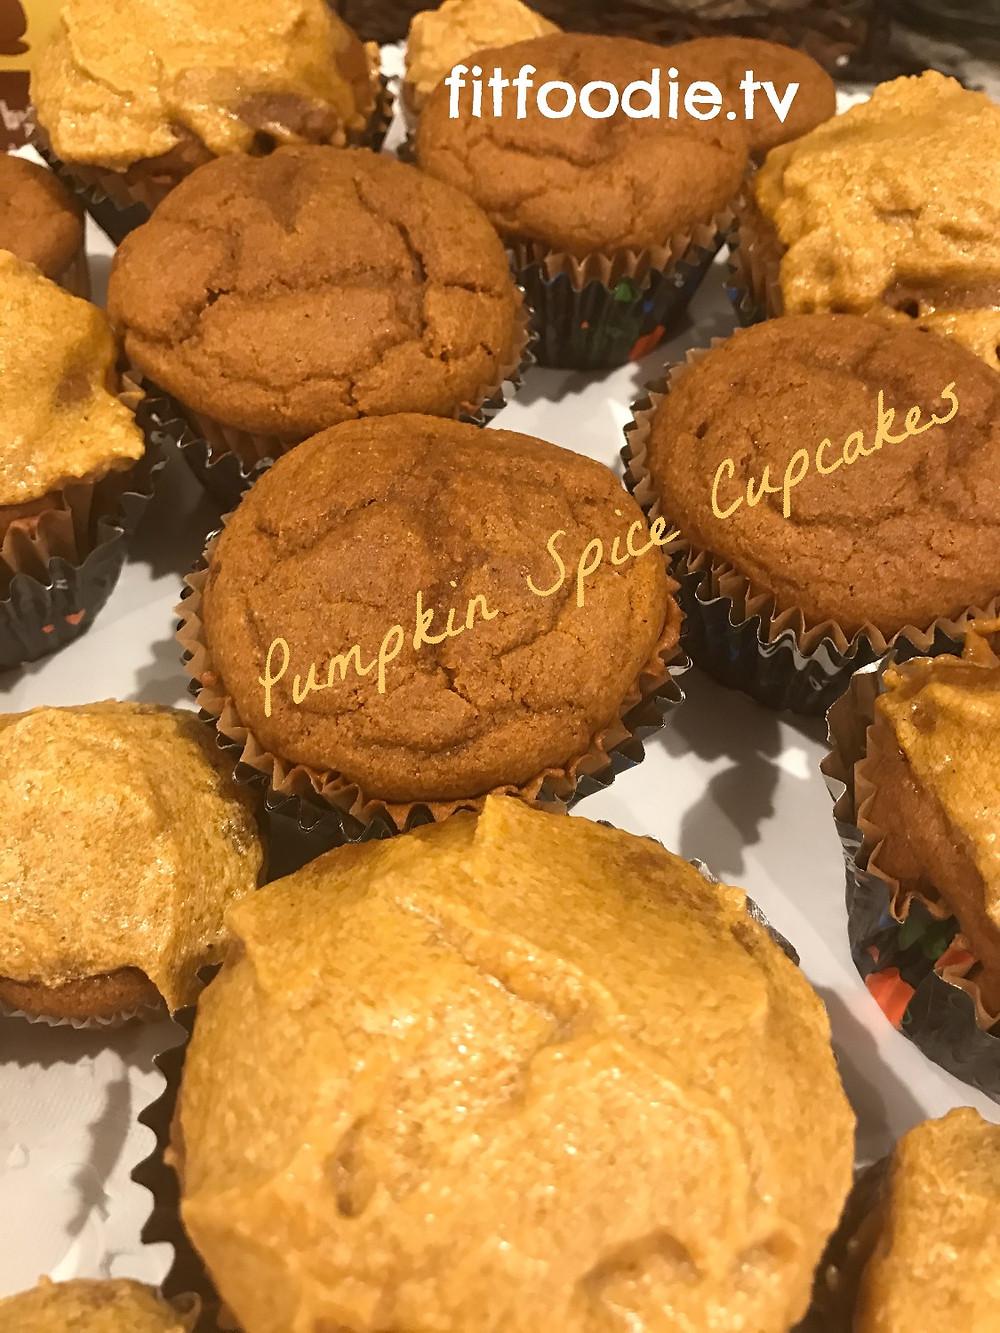 pumpkin spice cupcakes by fitfoodie.tv graziella baratta ventura